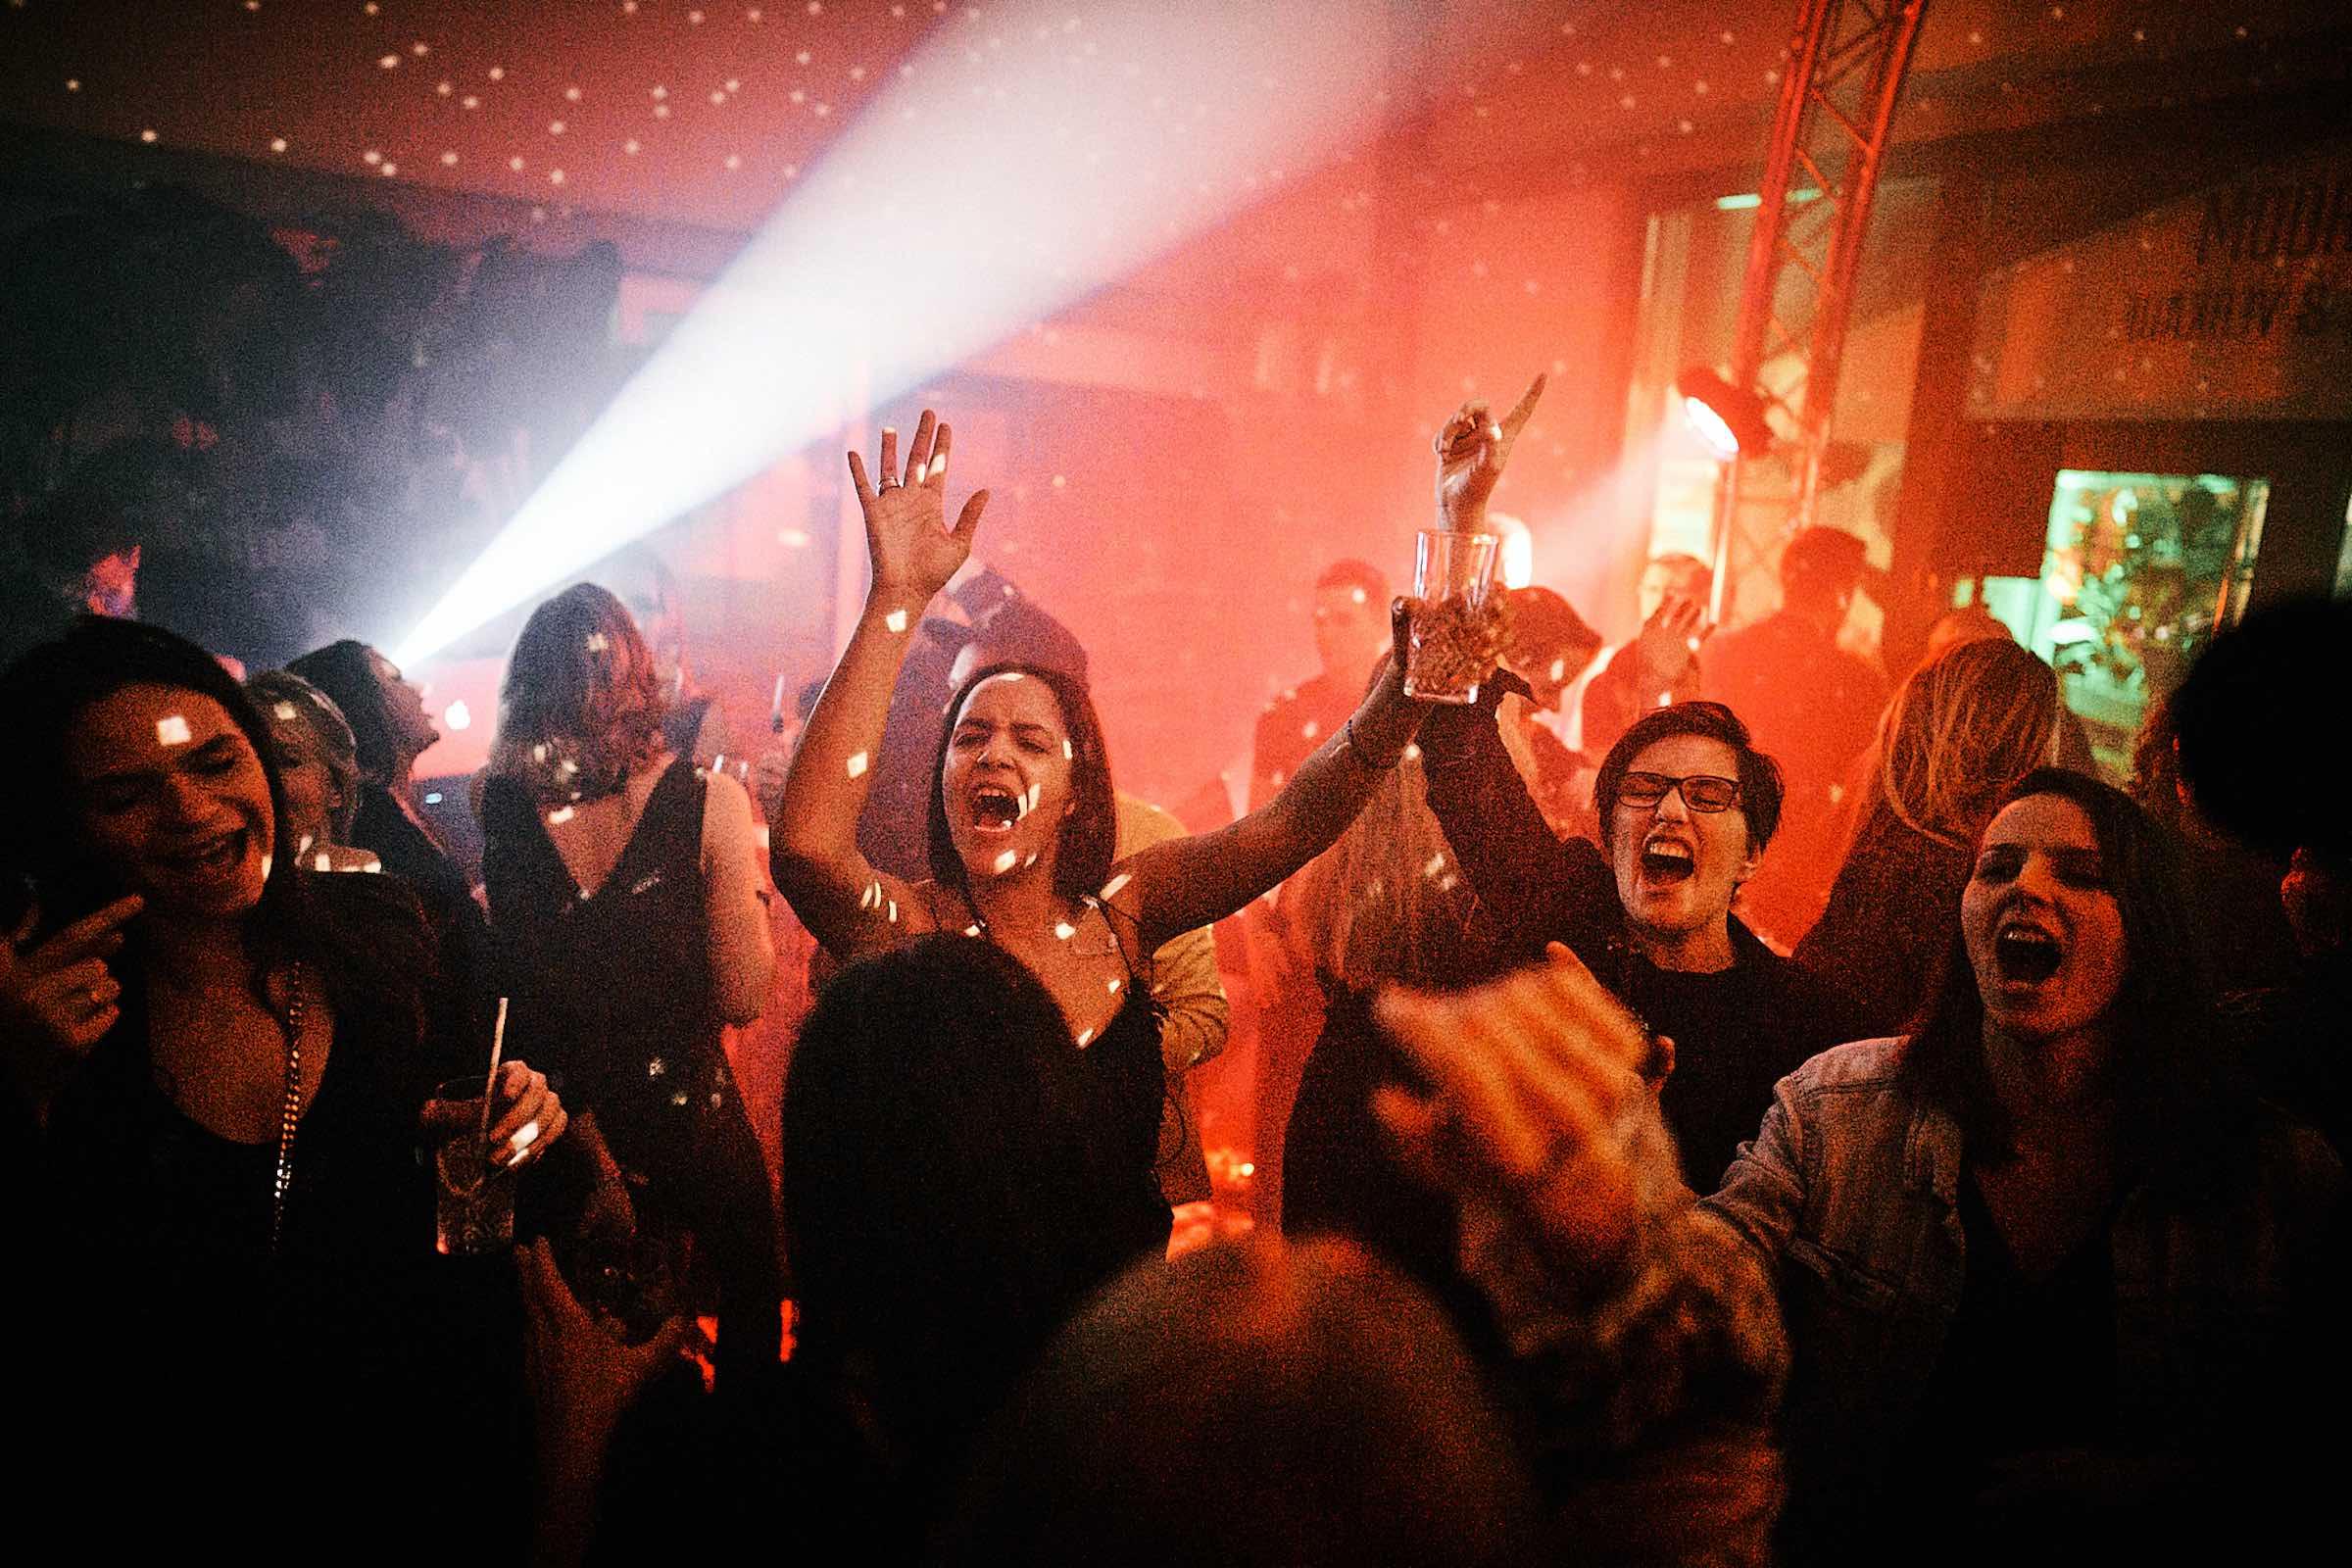 DJ | Hochzeit | DJ | Agentur | DJ | Service | DJ | Feier | Hochzeits | DJ | Messe | DJ | Firmenevent | Firmenfeier | DJ | Geburtstag | Discjockey | Weihnachtsfeier | DJ | Sommerfest | Event | Buchen | Mieten | Lehmann | Eventservice